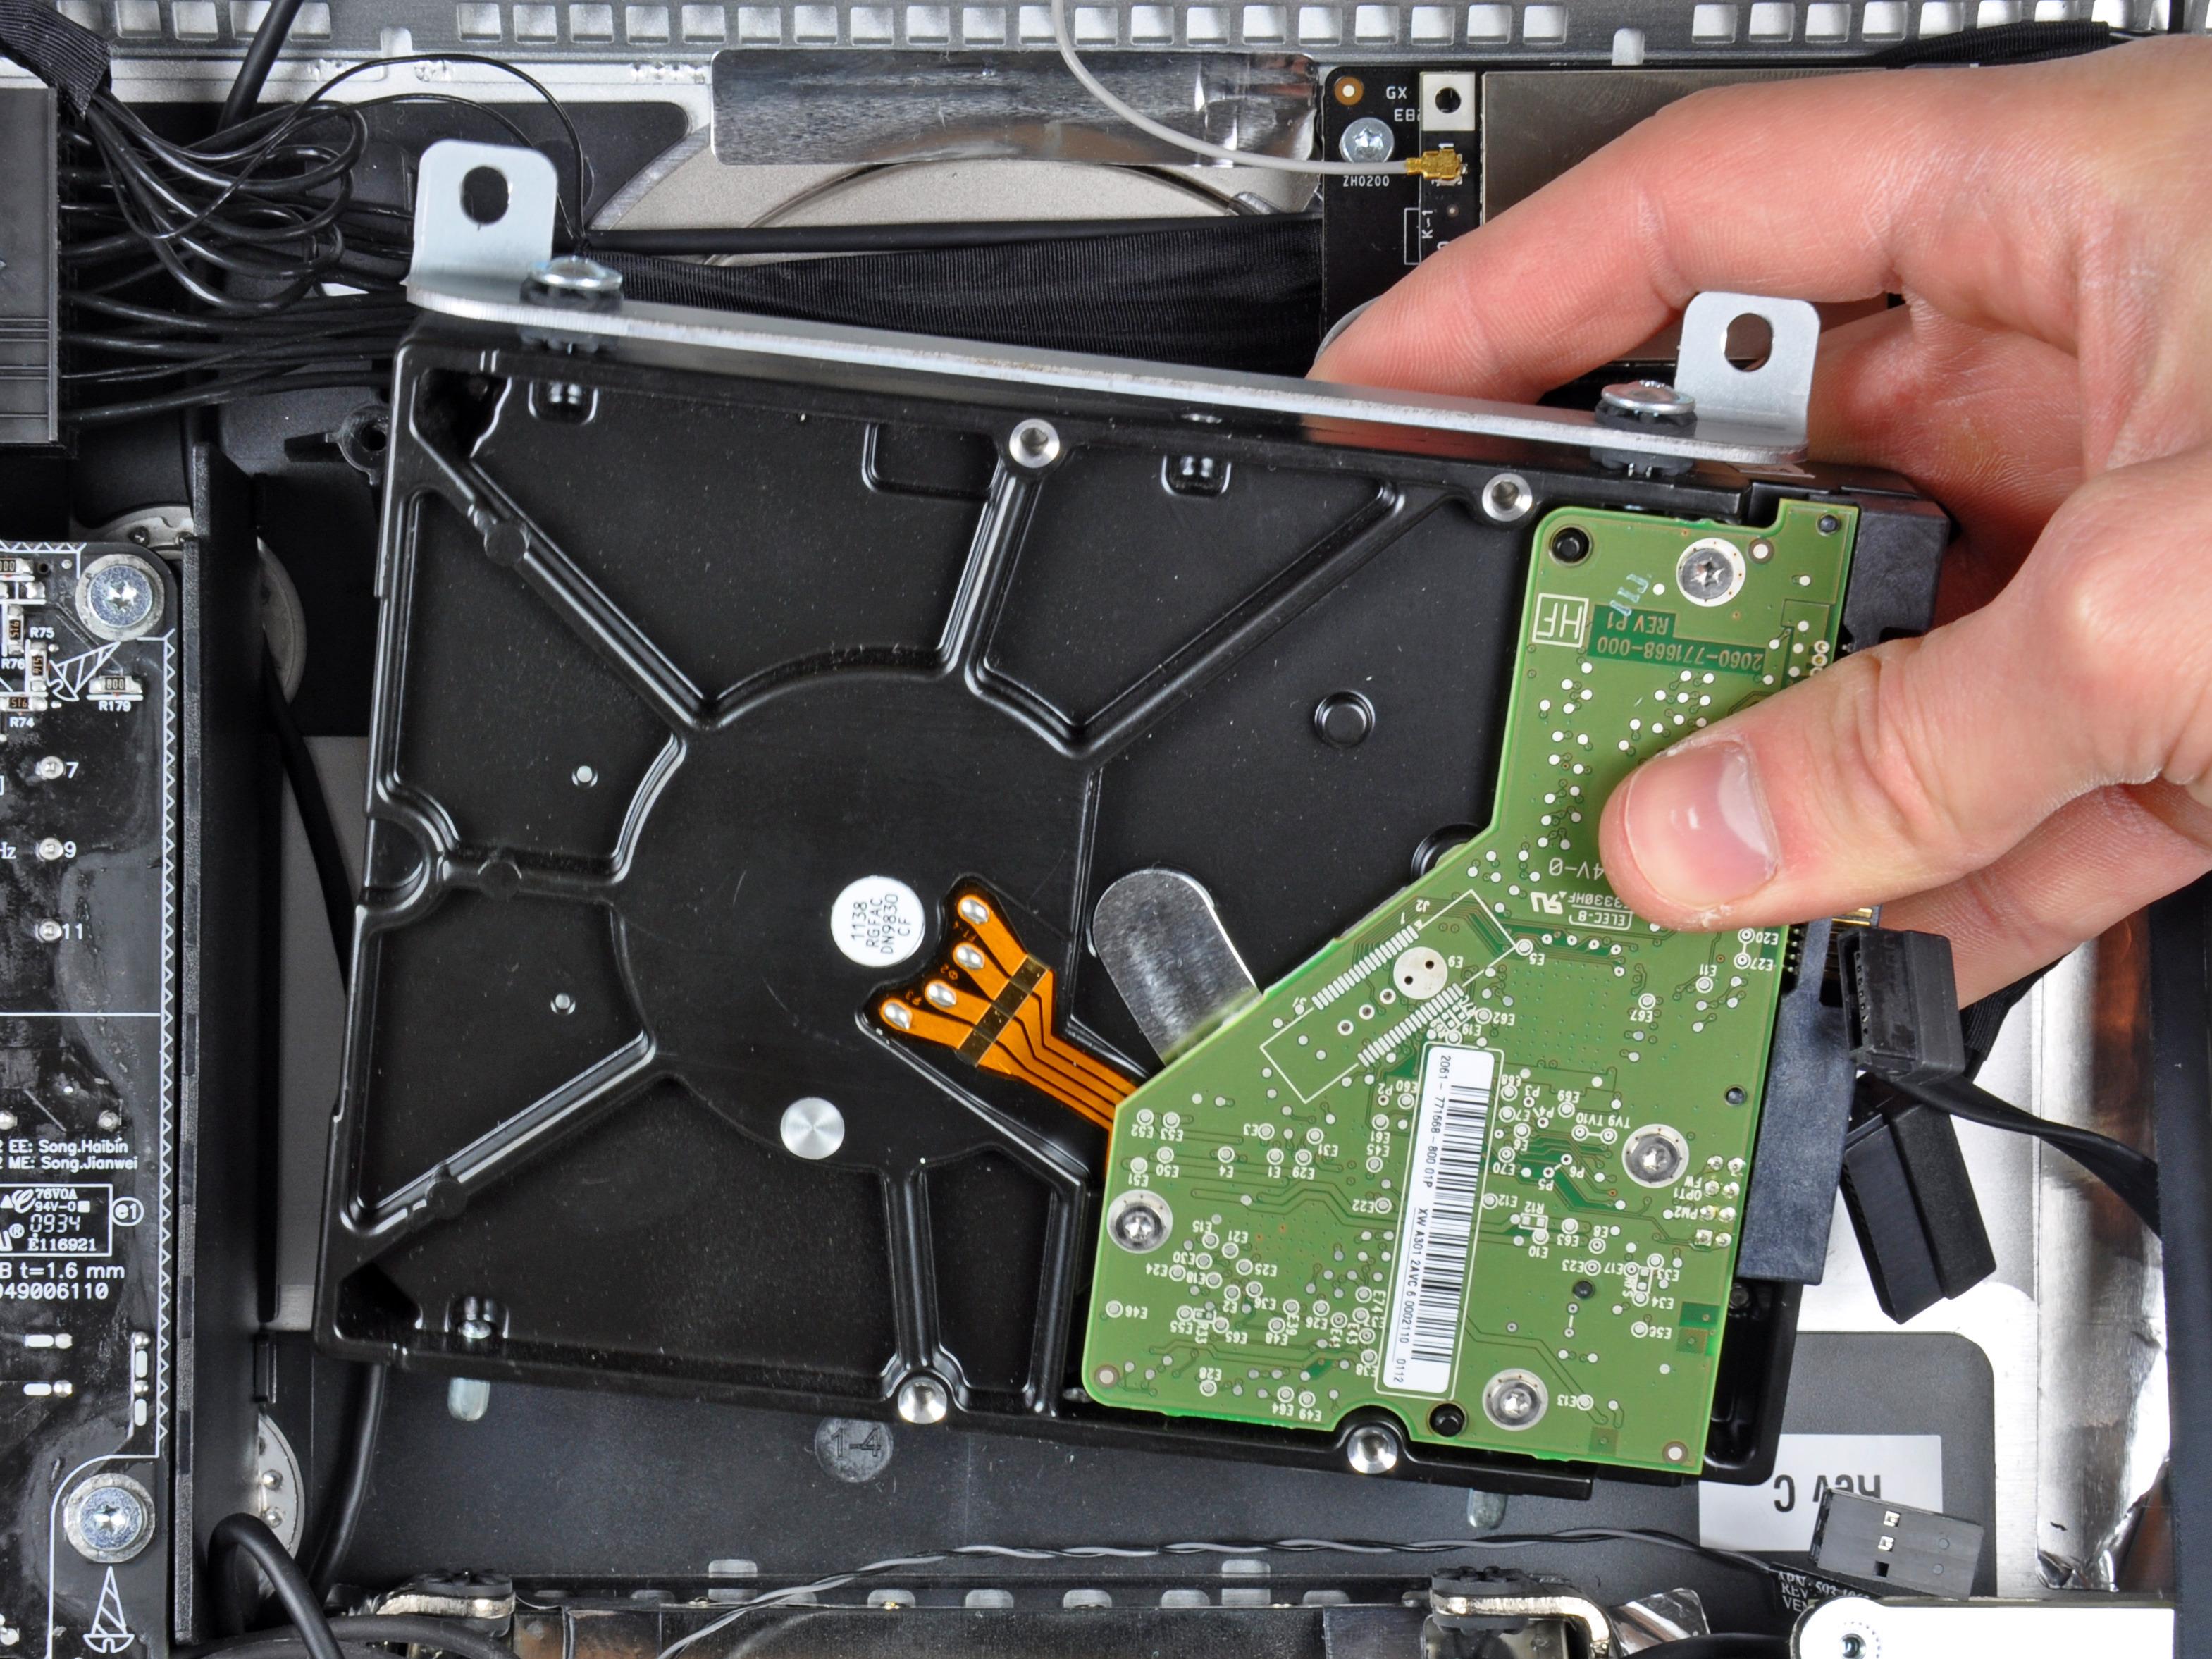 "iMac Intel 27"" EMC 2390 Festplatte austauschen"